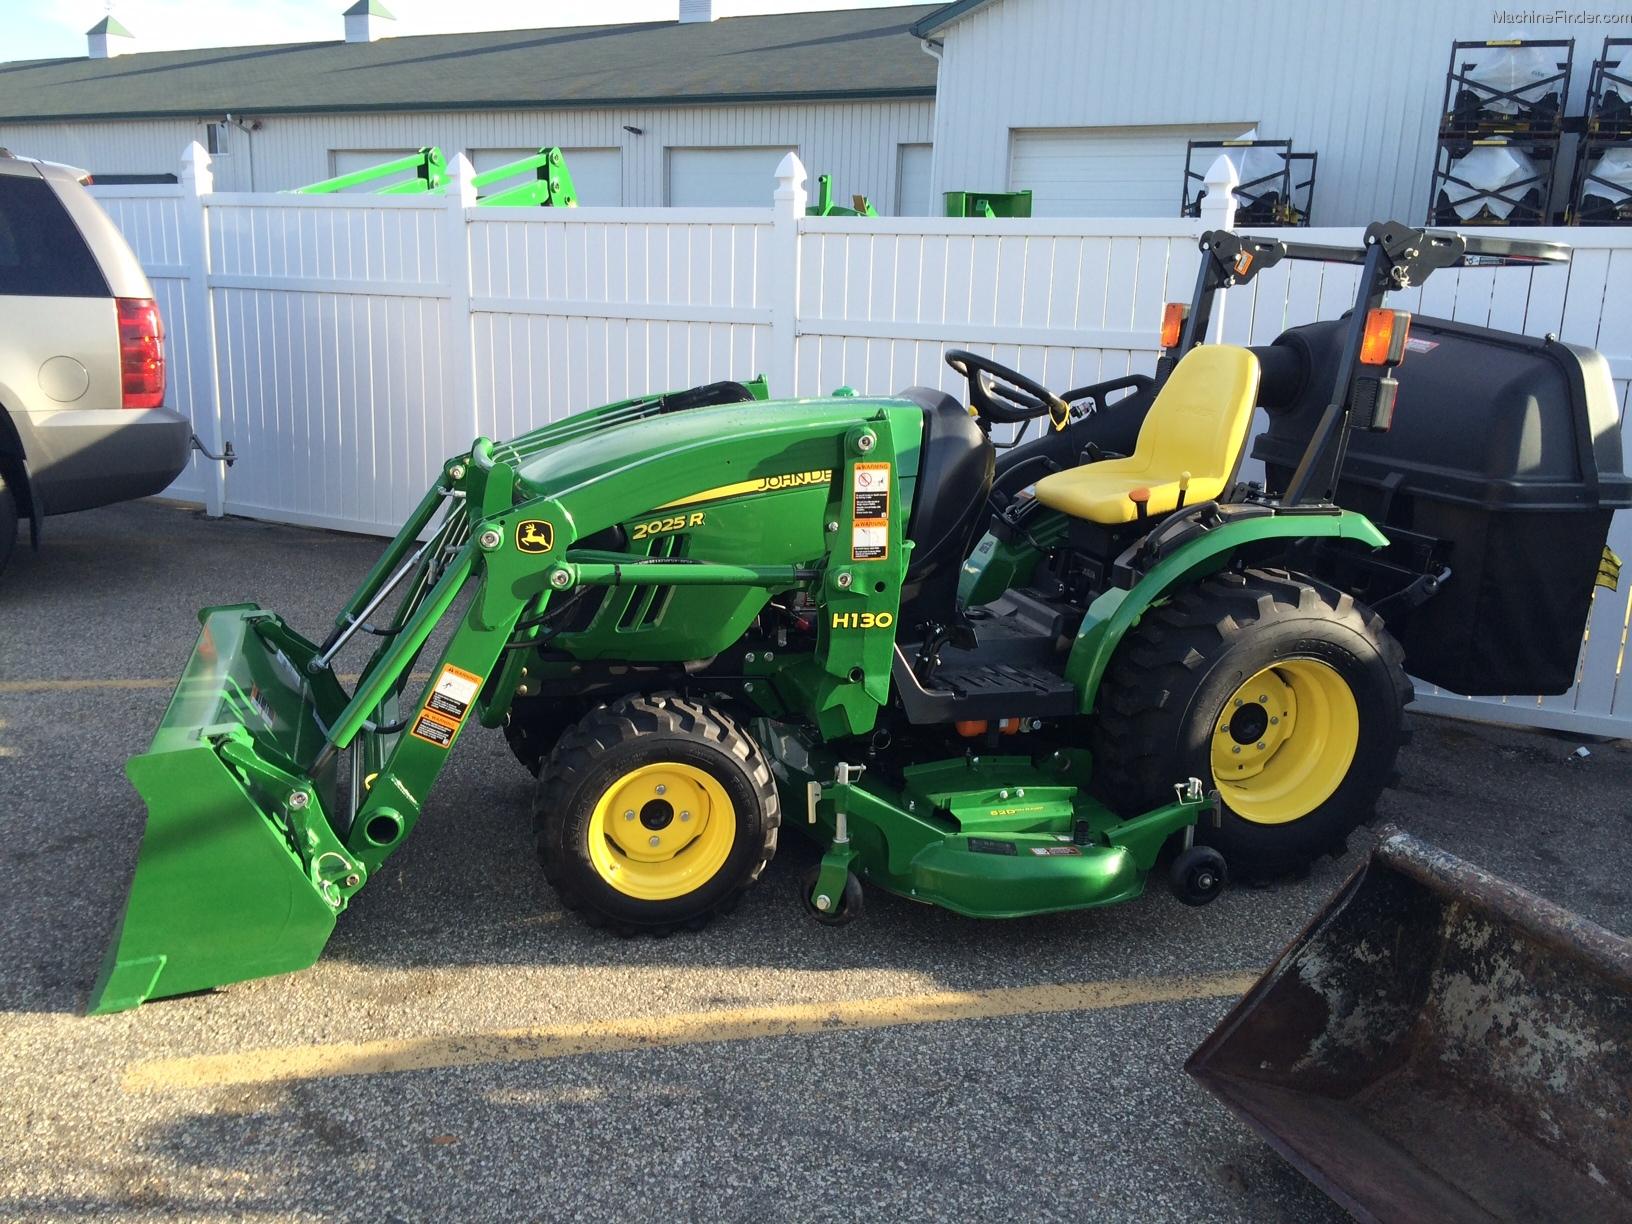 2013 John Deere 2025R Tractors - Compact (1-40hp.) - John ...